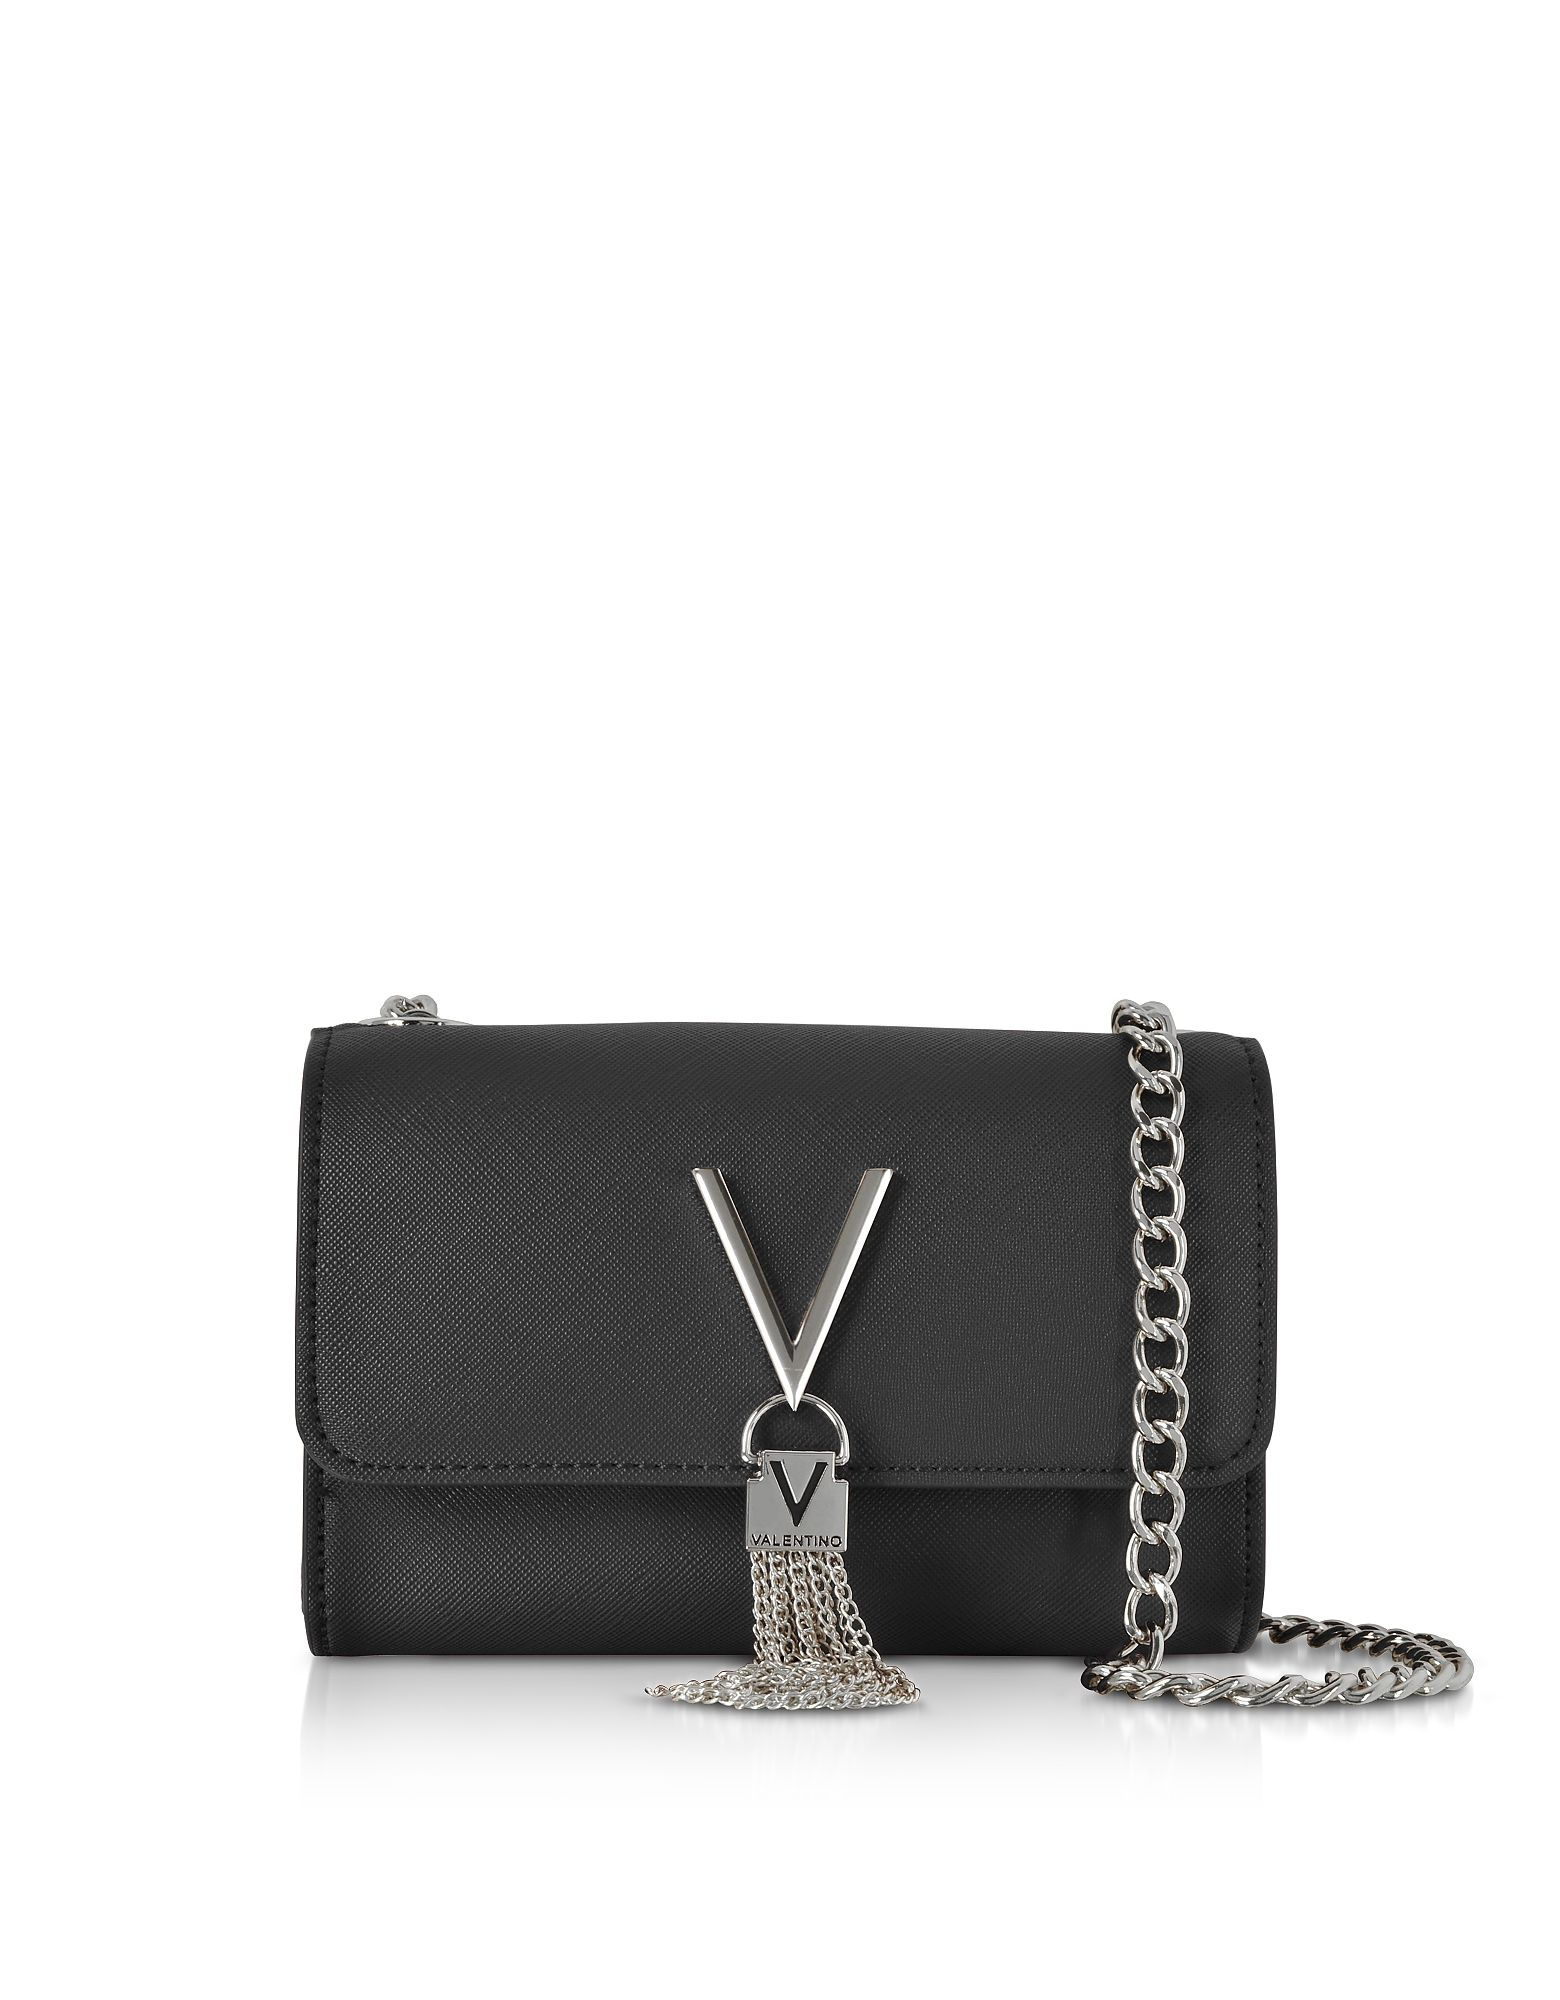 37a0aa6c49c VALENTINO BY MARIO VALENTINO ECO LEATHER DIVINA MINI SHOULDER BAG.  #valentinobymariovalentino #bags #shoulder bags #leather #